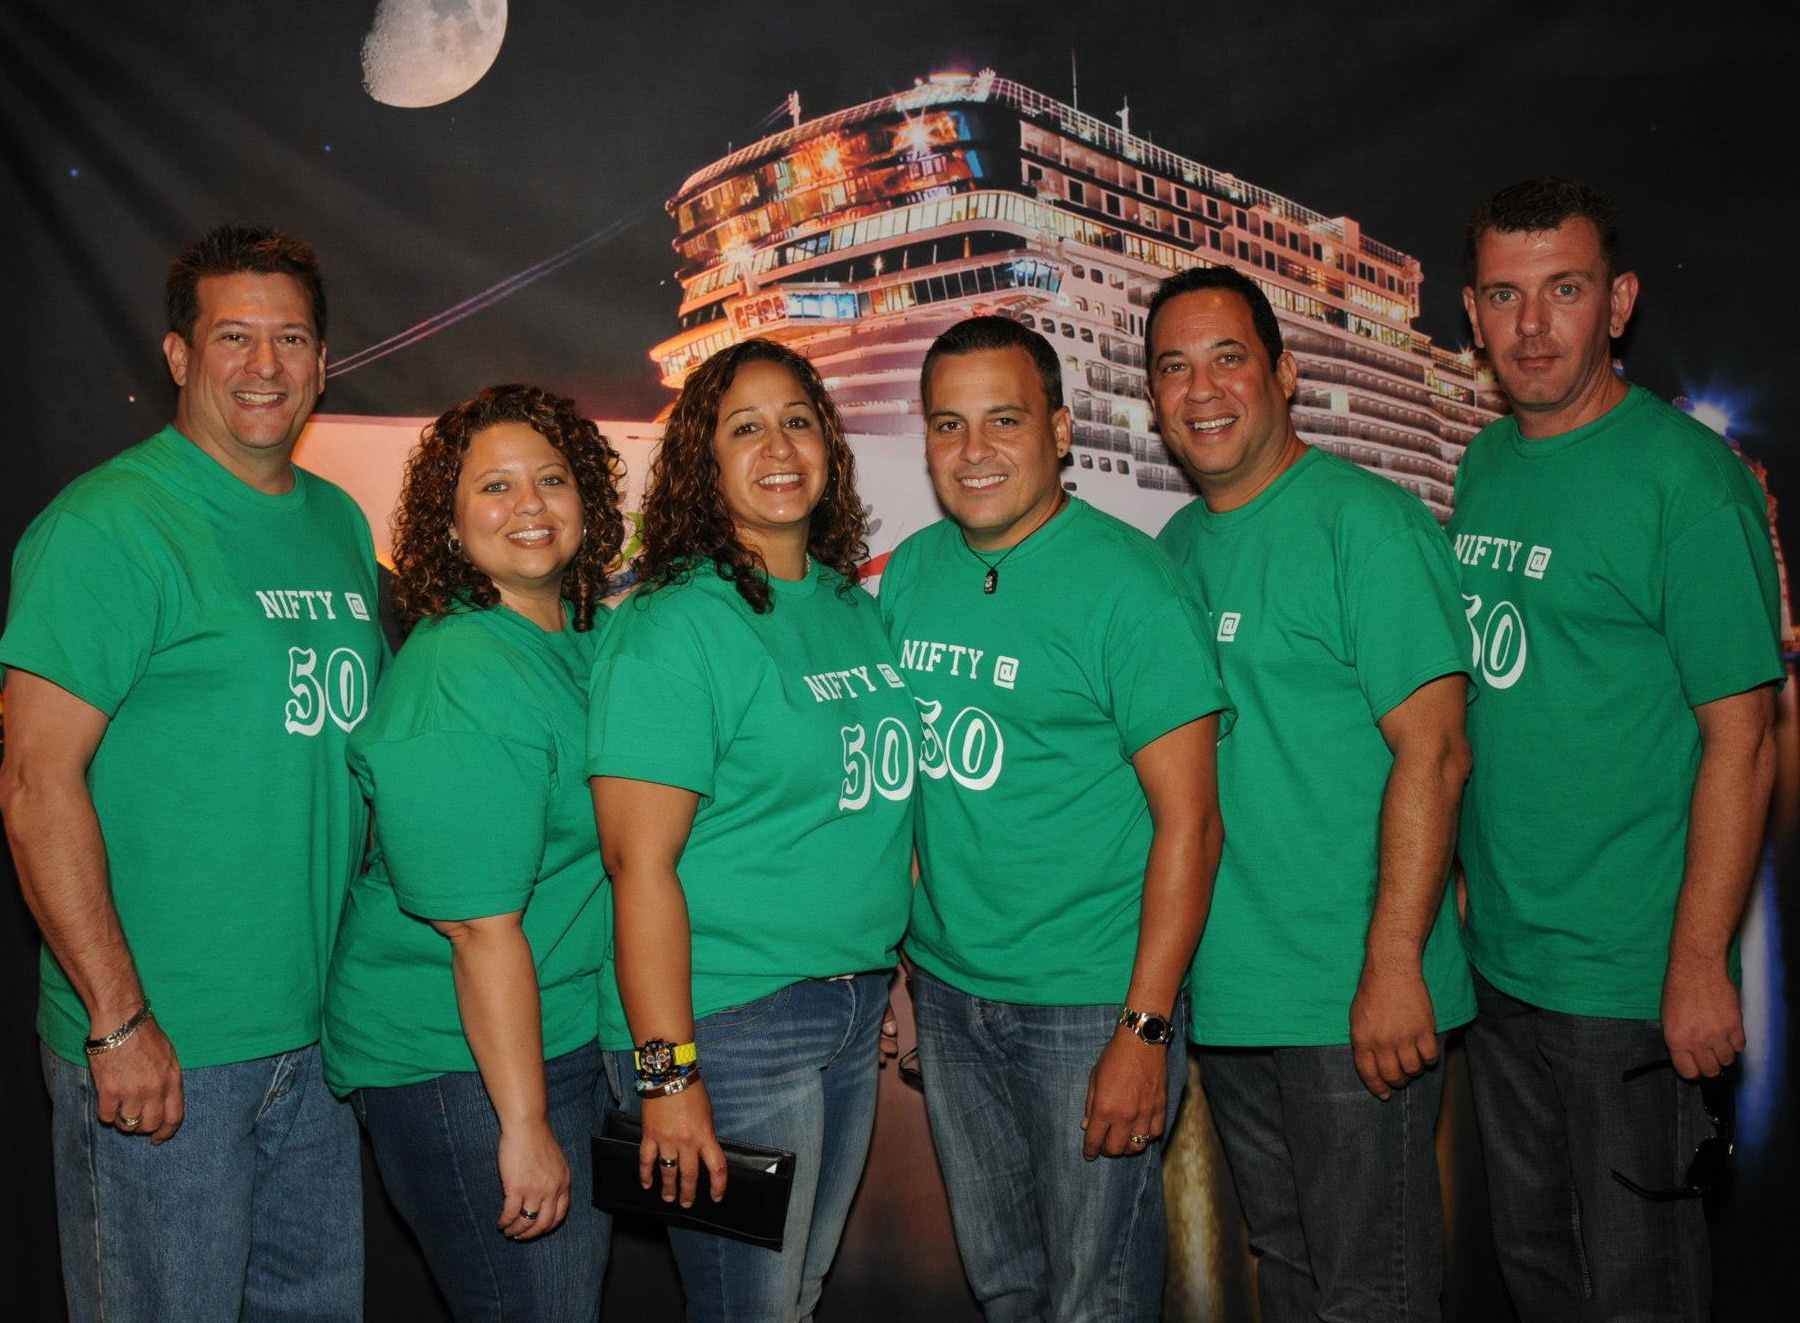 50th Birthday Shirts Group